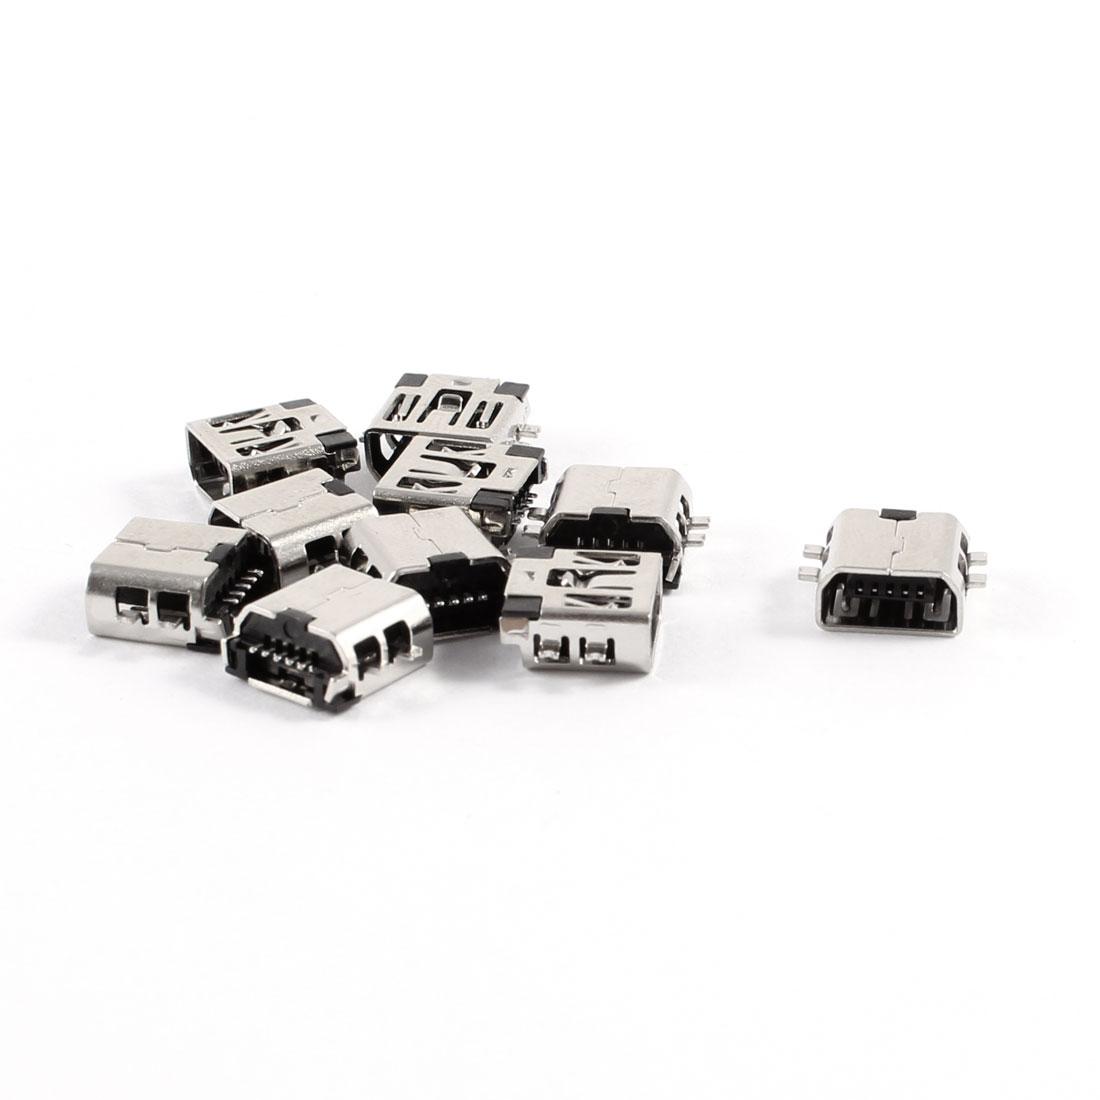 10 Pcs Female Mini USB Type B 5-Pin SMT SMD Socket Jack Connector Port PCB Board